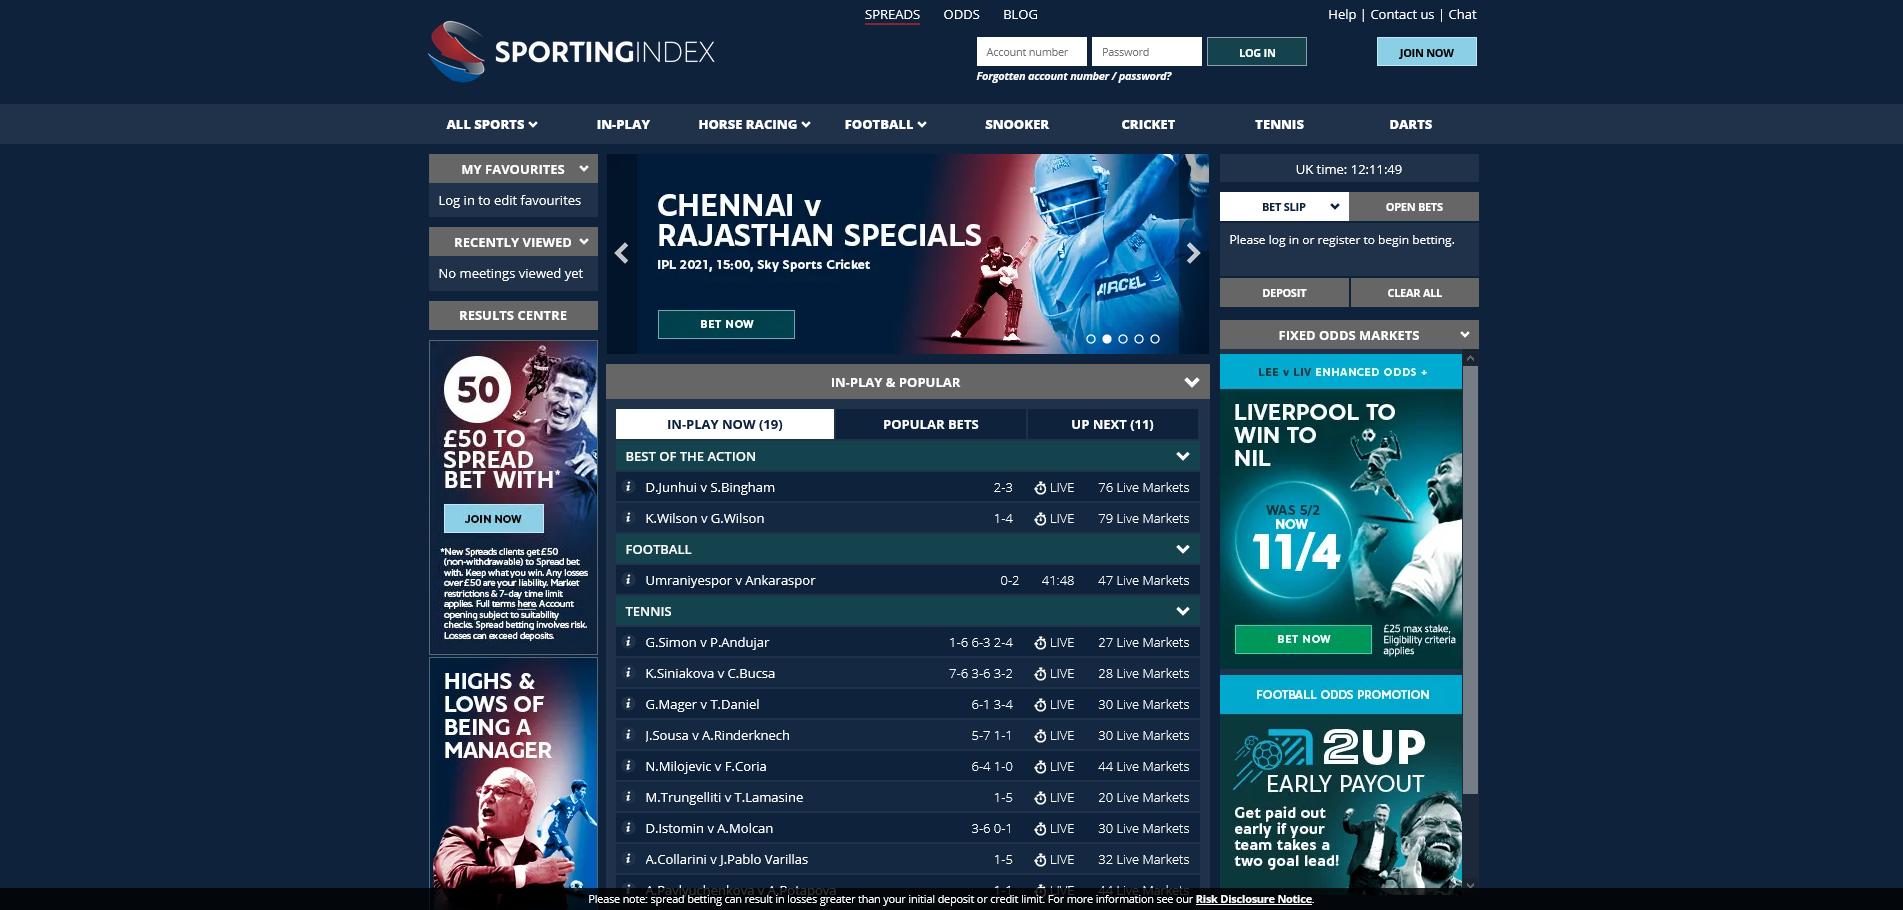 Sporting index